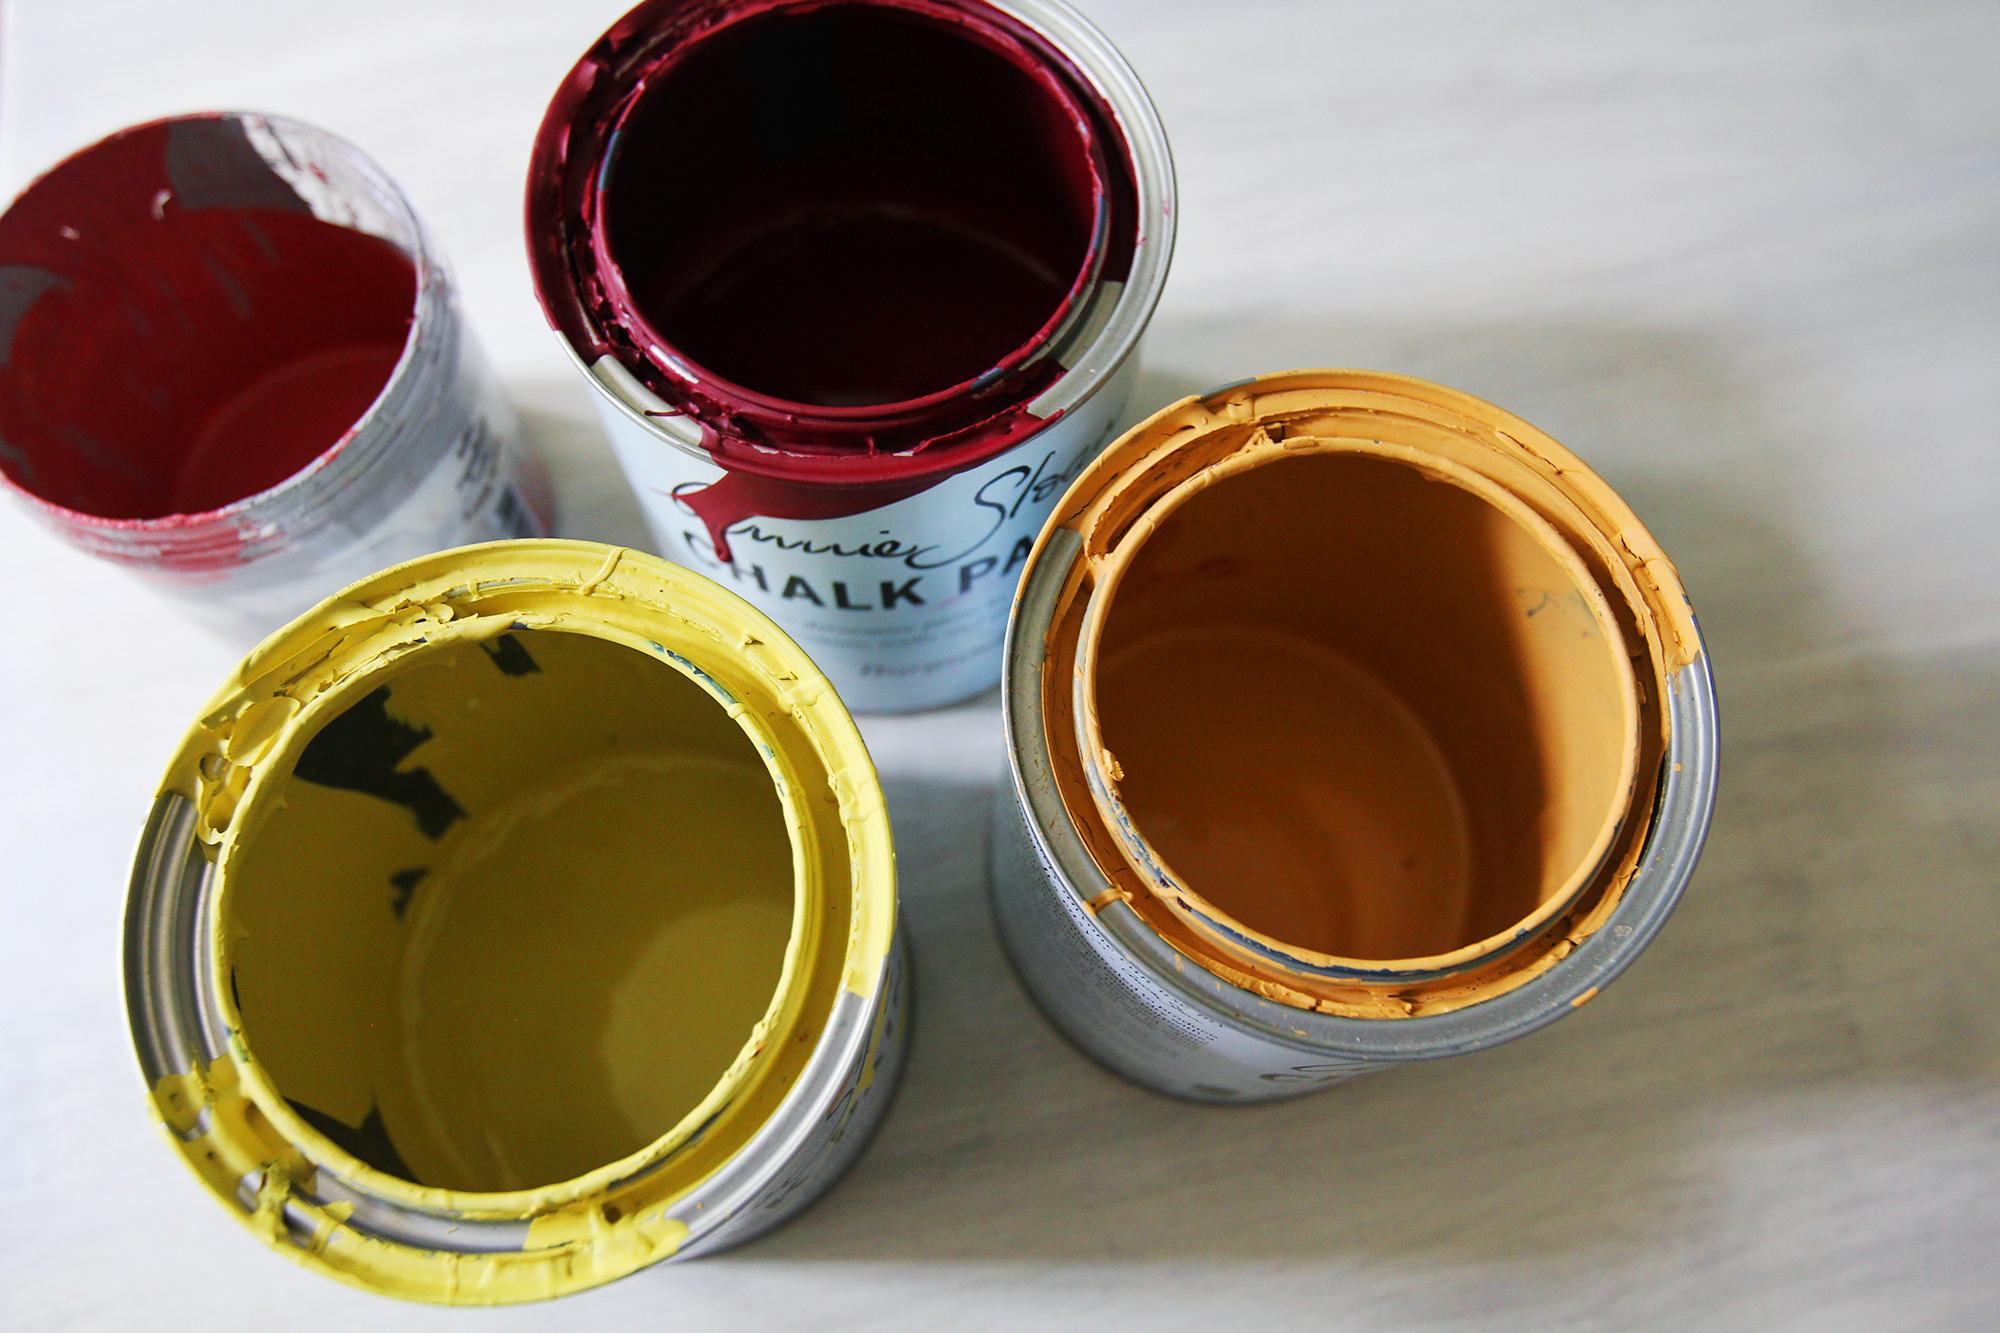 jo-torrijos-a-simpler-design-annie-sloan-chalk-paint-burgundy-arles-english-yellow-coral-atlanta-painted-furniture-9.jpg